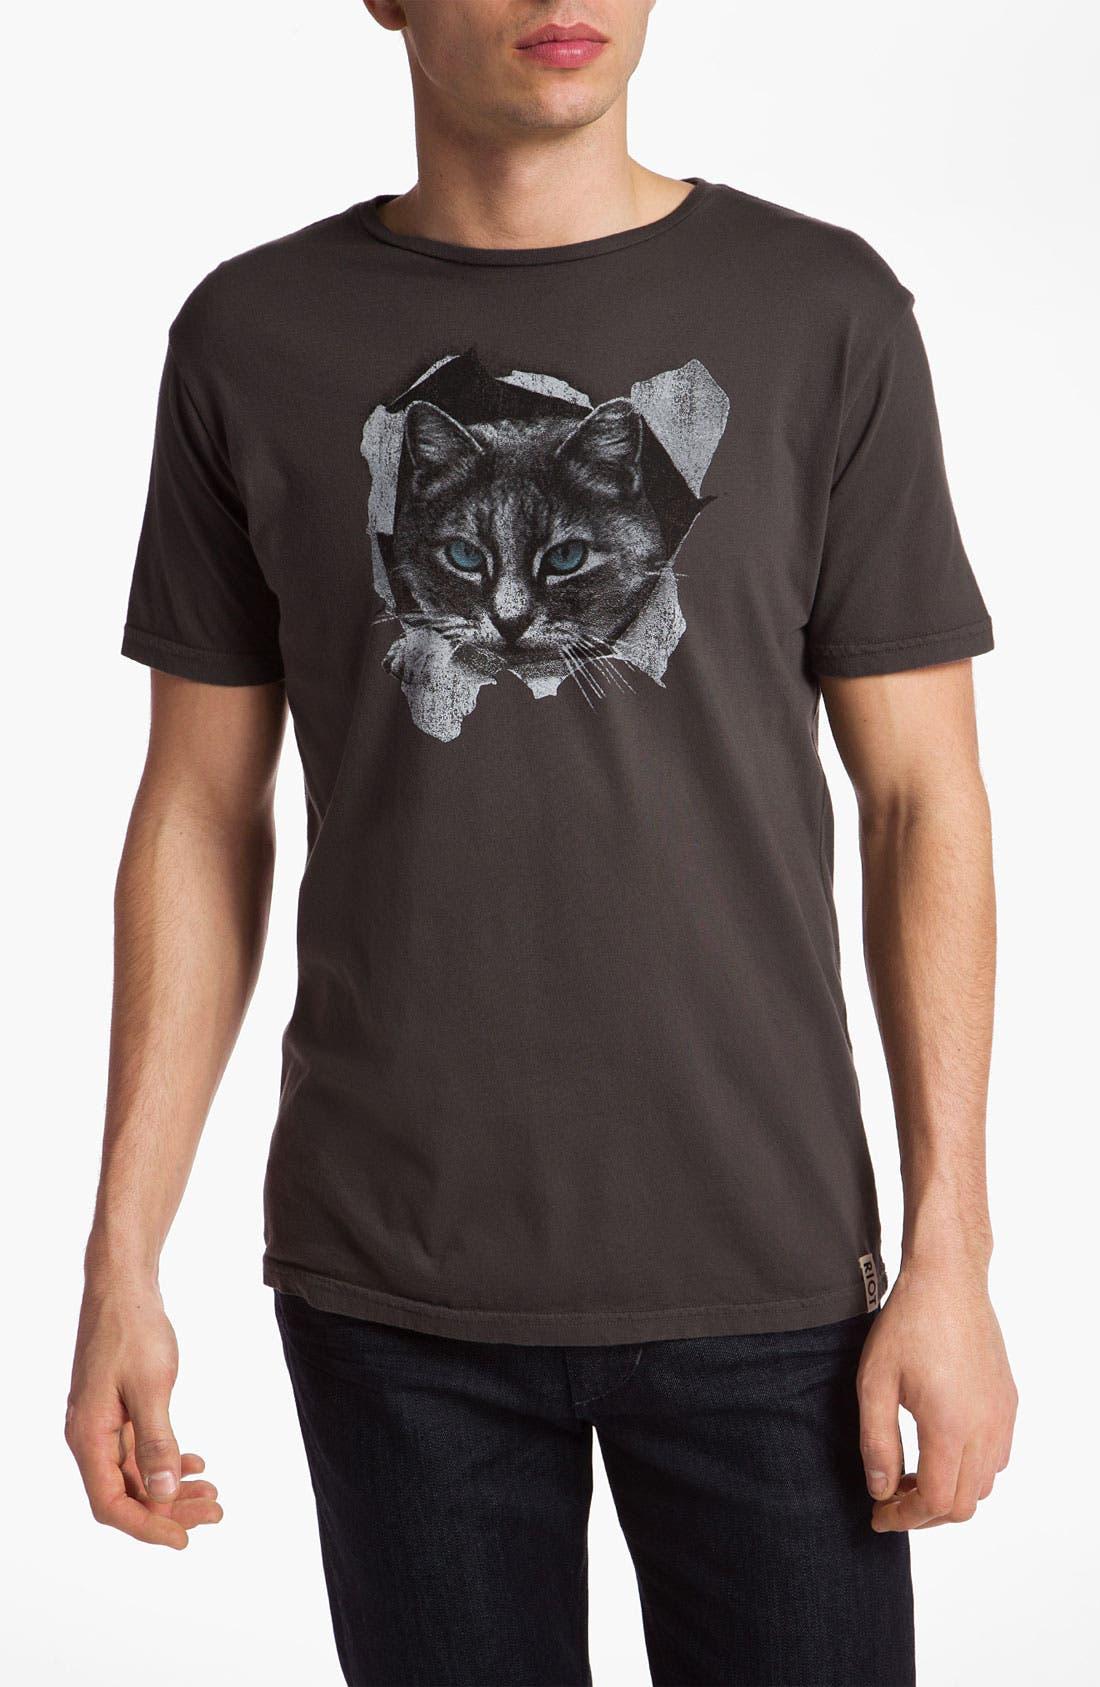 Alternate Image 1 Selected - Sub_Urban Riot 'Peekaboo Cat' Graphic T-Shirt